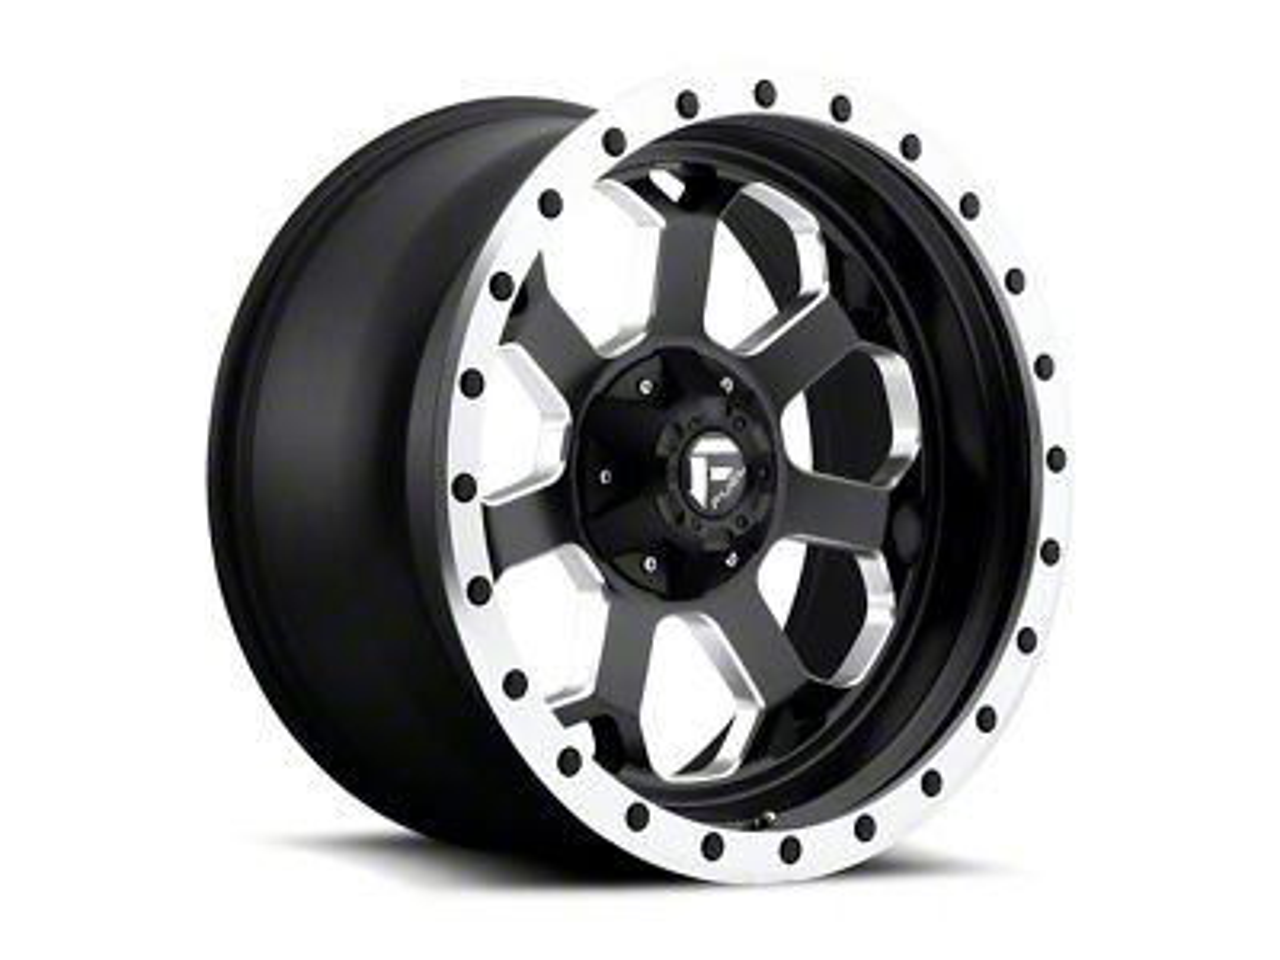 Fuel Wheels Savage Black Milled 6-Lug Wheel - 20x10 (99-18 Silverado 1500)